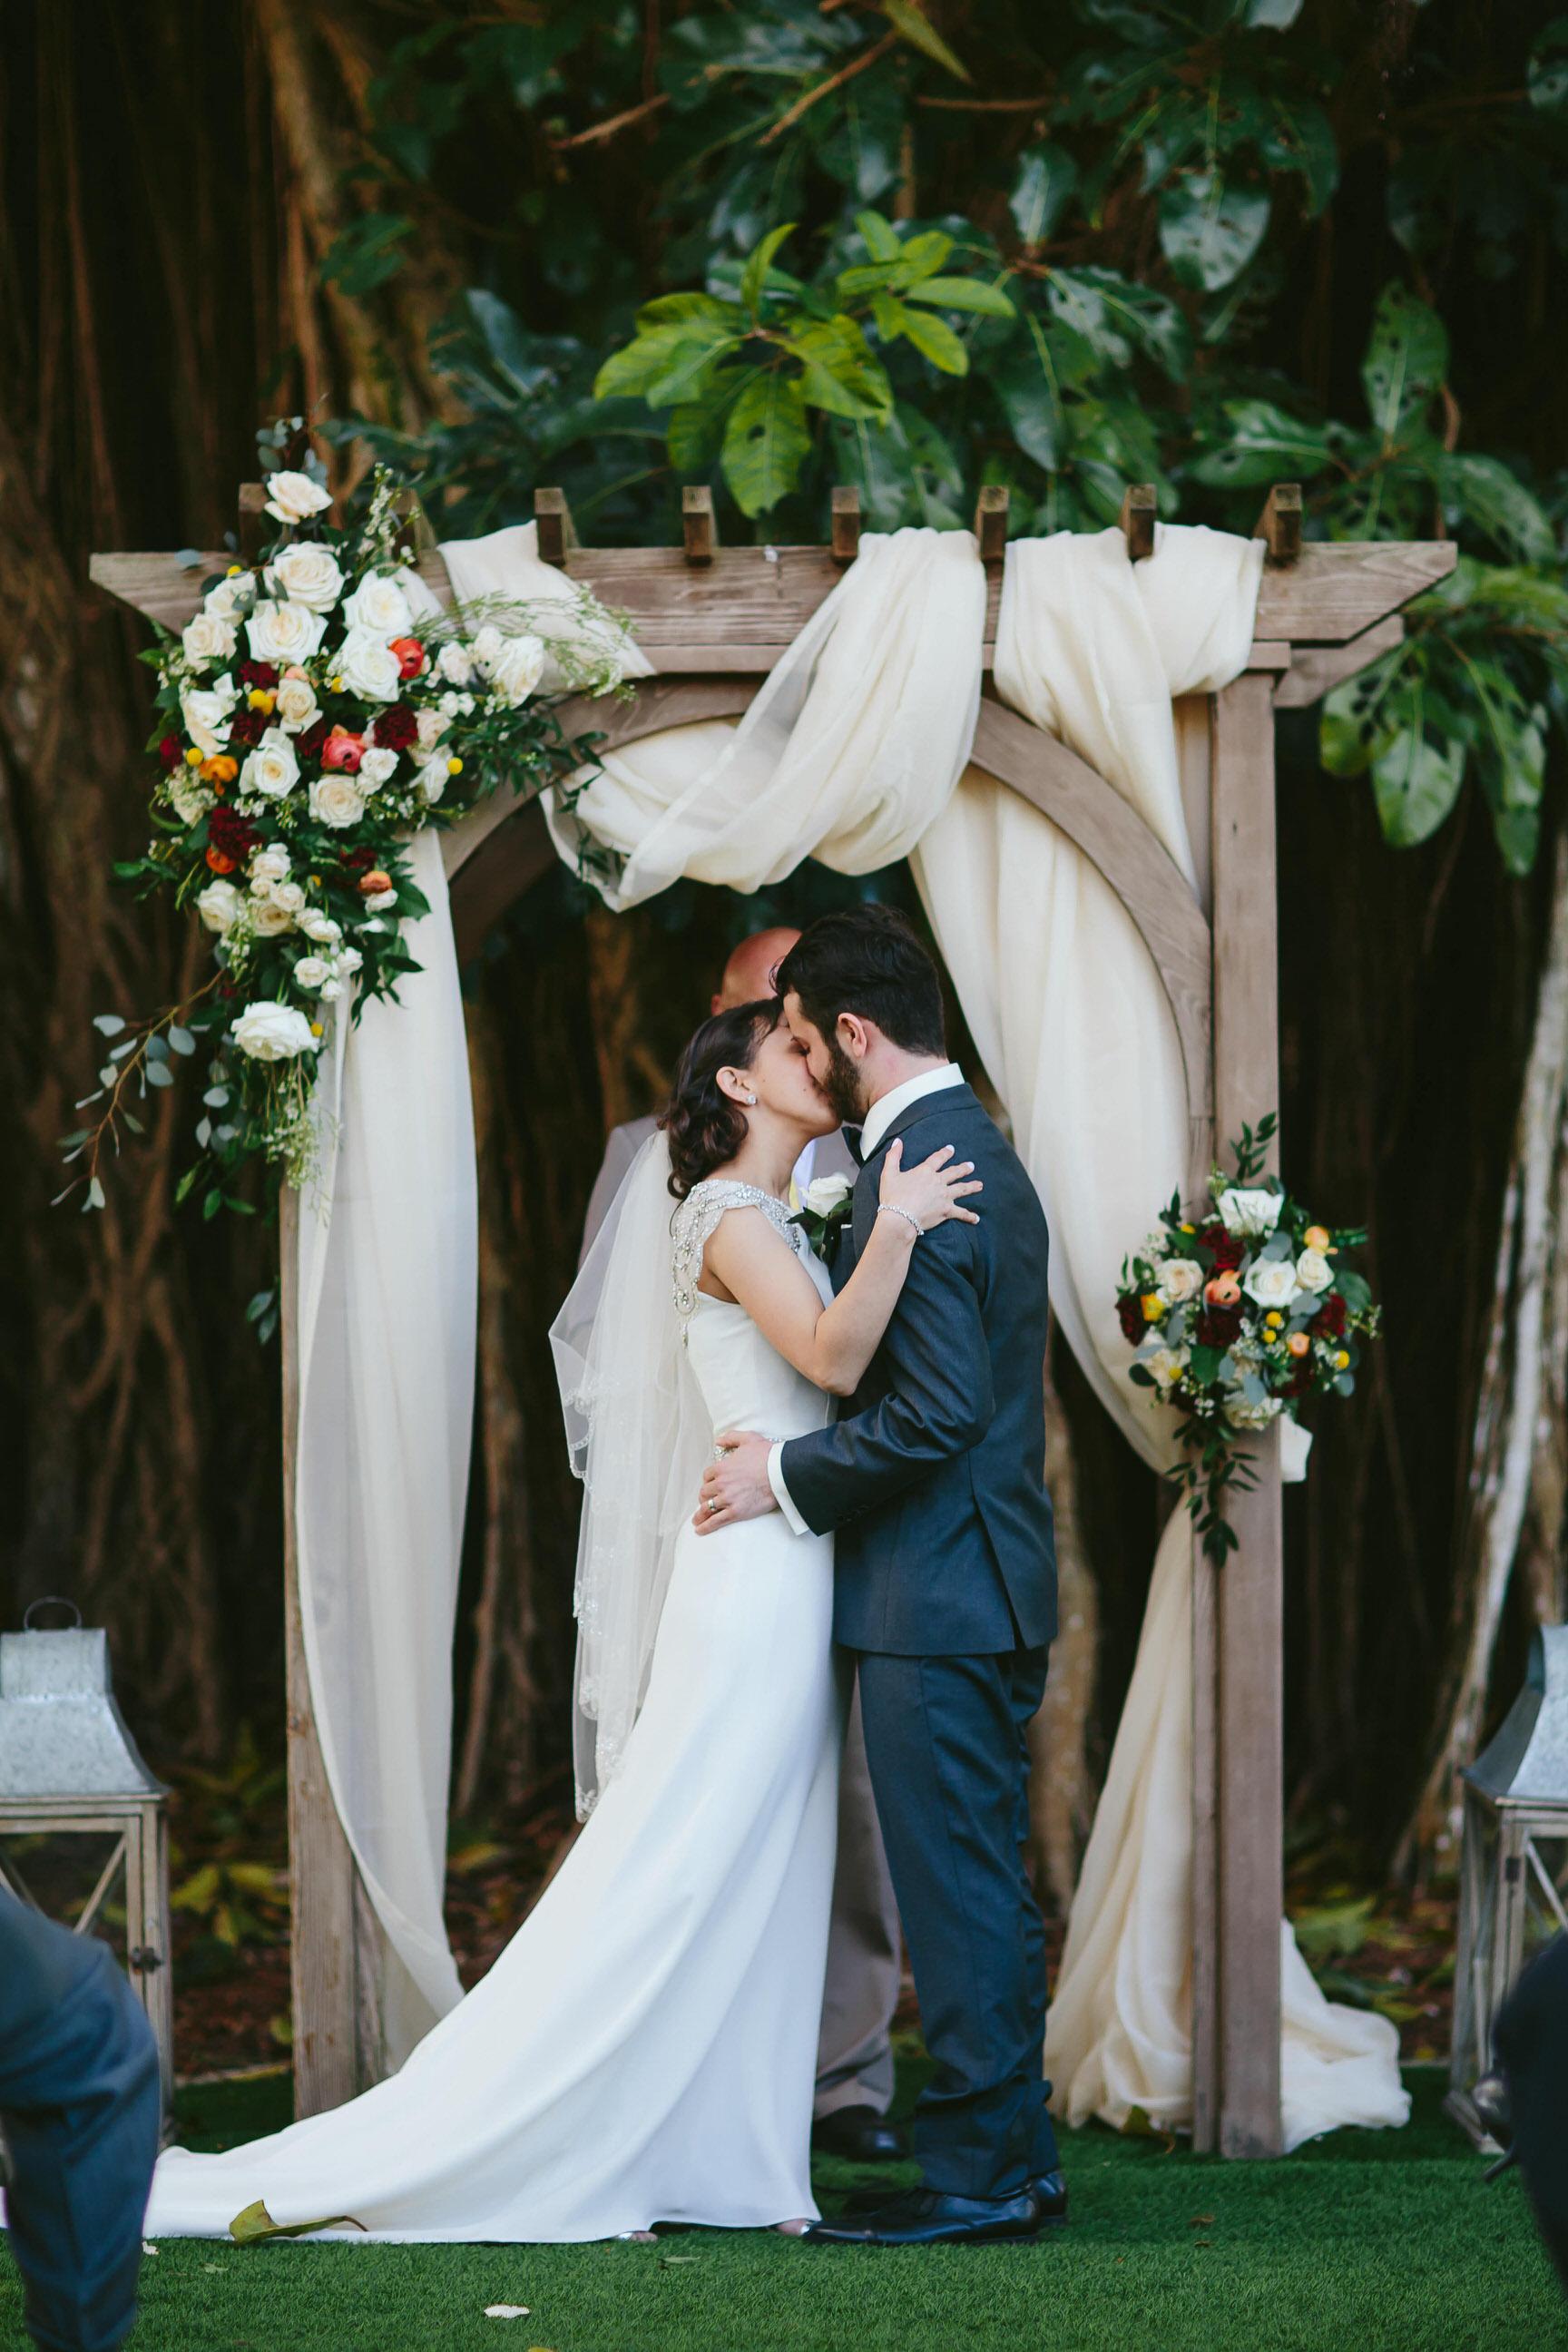 bride-groom-kiss-ceremony-tiny-house-photo-award-winning-travel-photographer.jpg